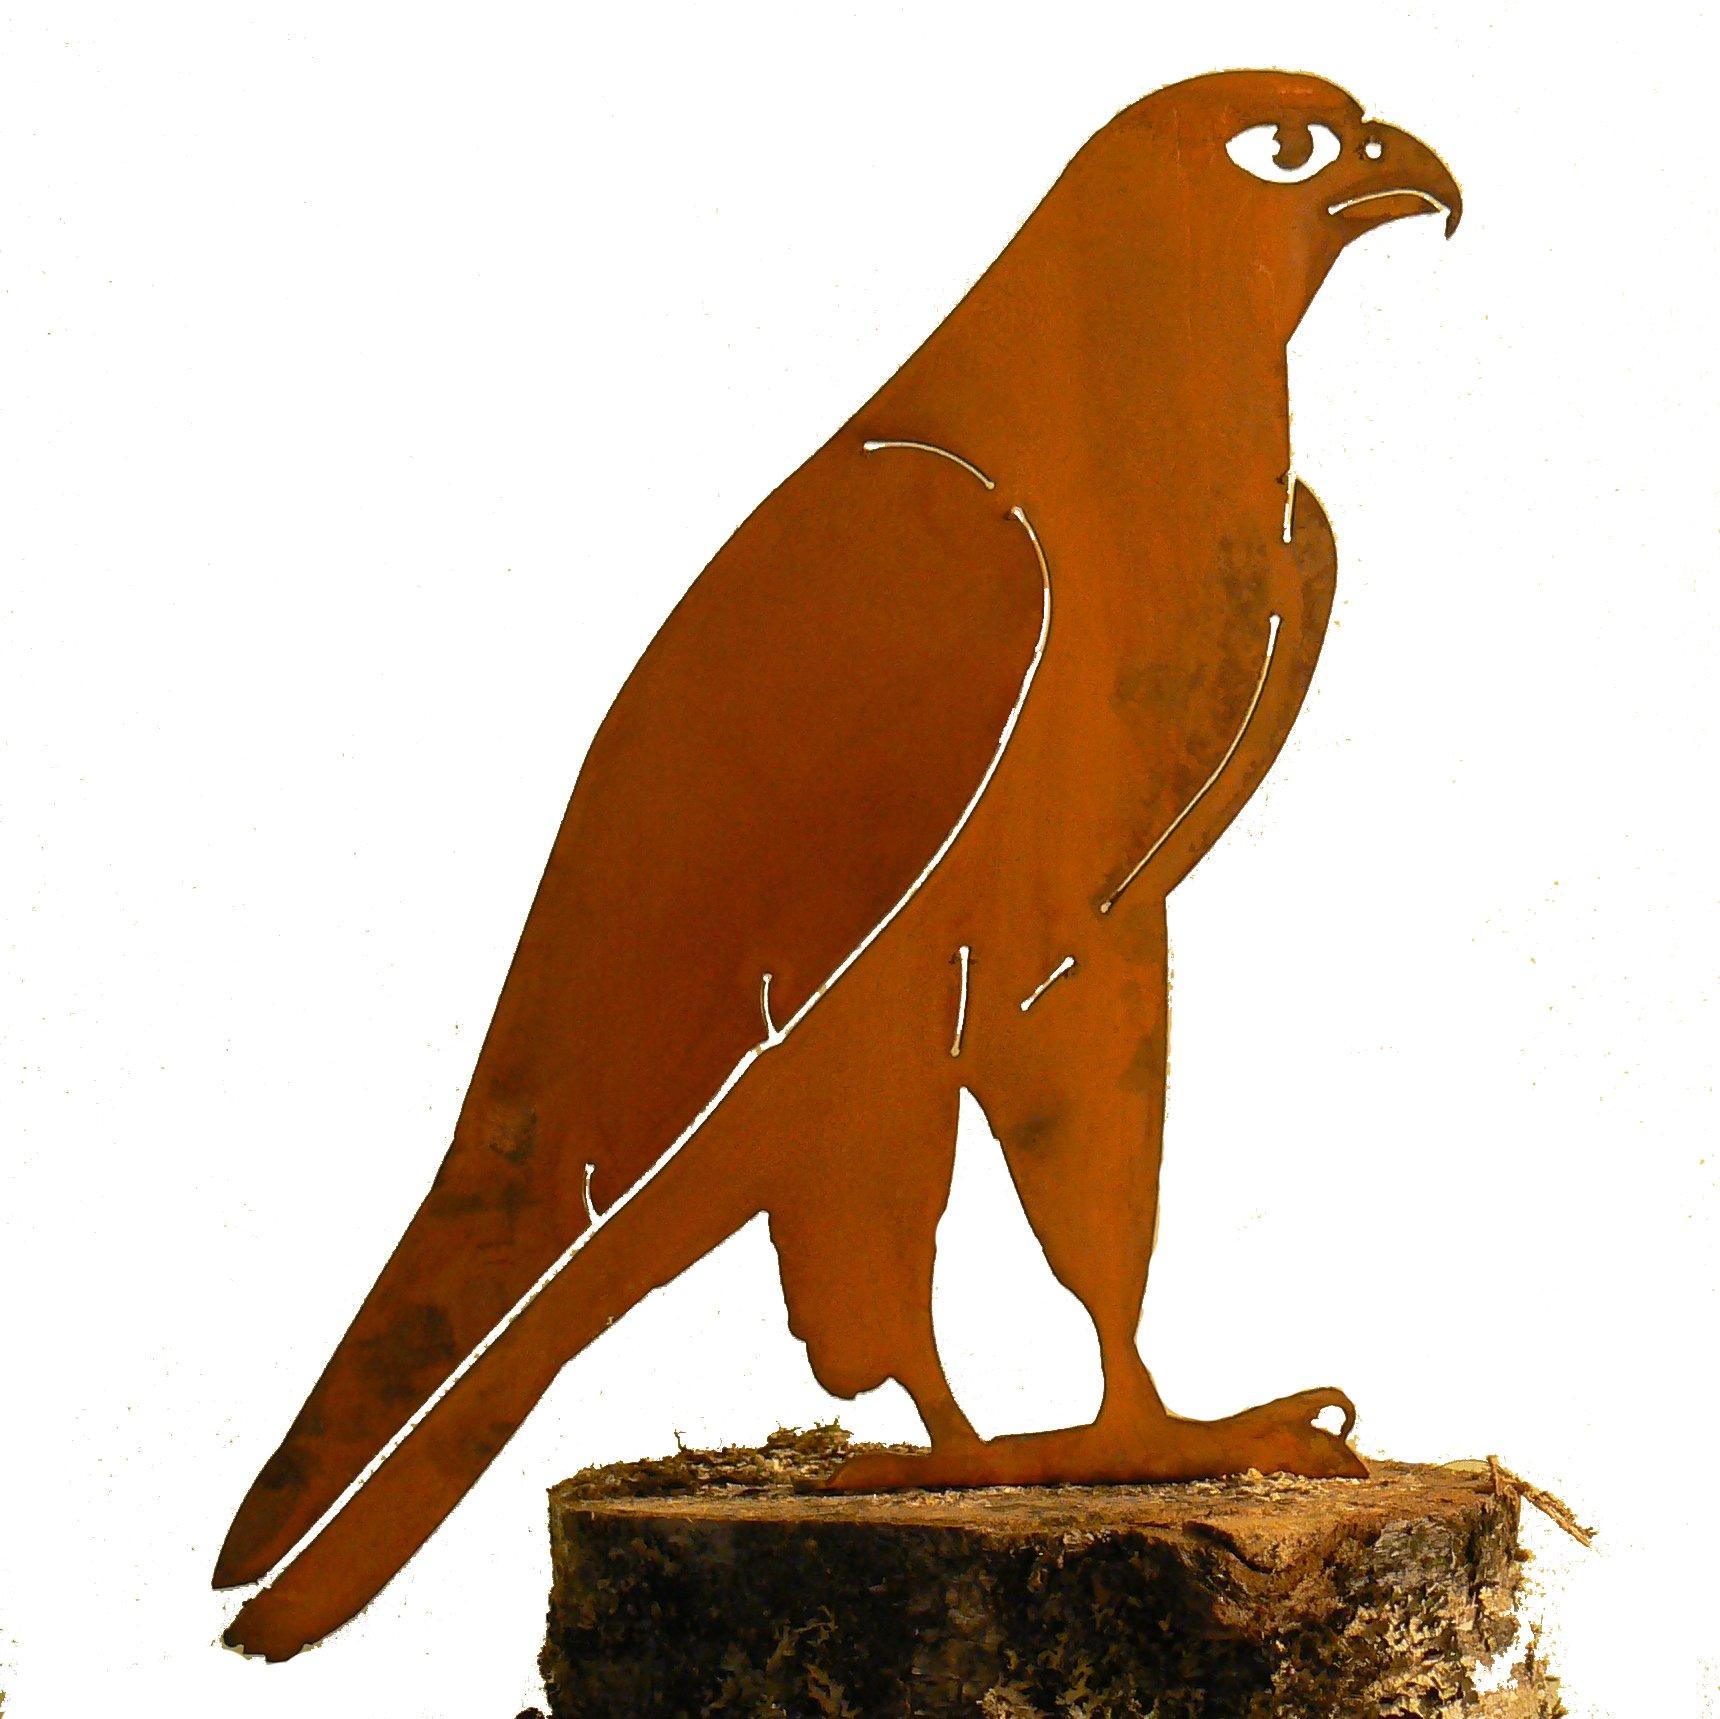 Elegant Garden Design Peregrine Falcon, Steel Silhouette with Rusty Patina